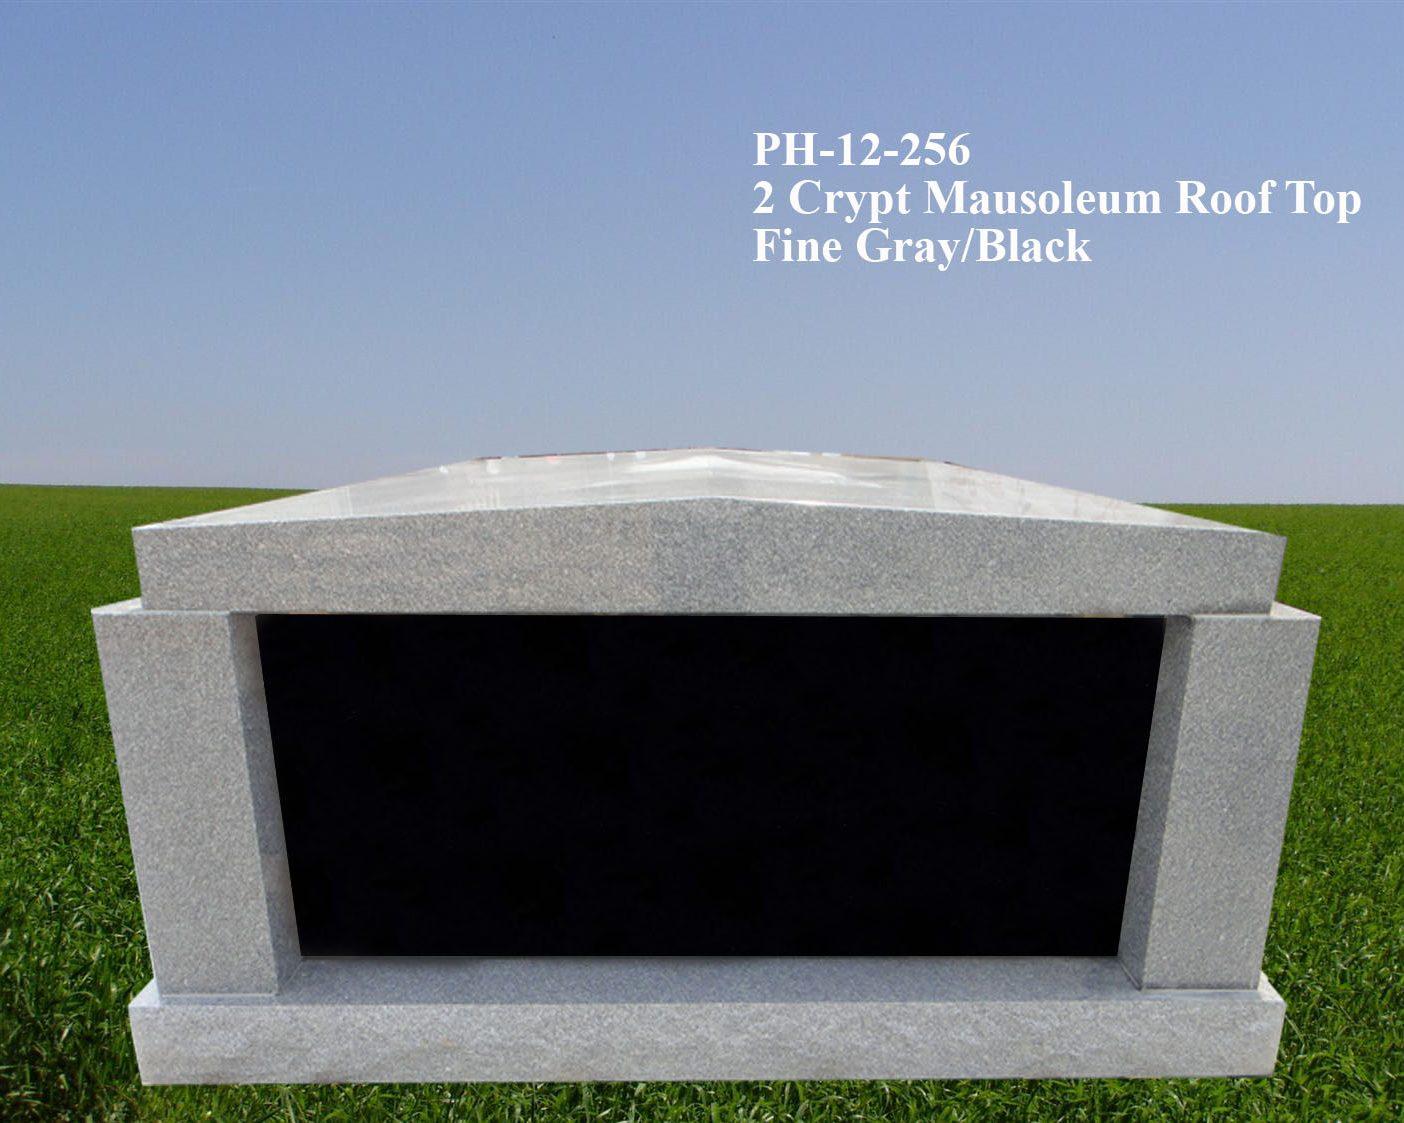 EG-12-256 / Fine Gray & Black / 2 Crypt Rooftop Mausoleum